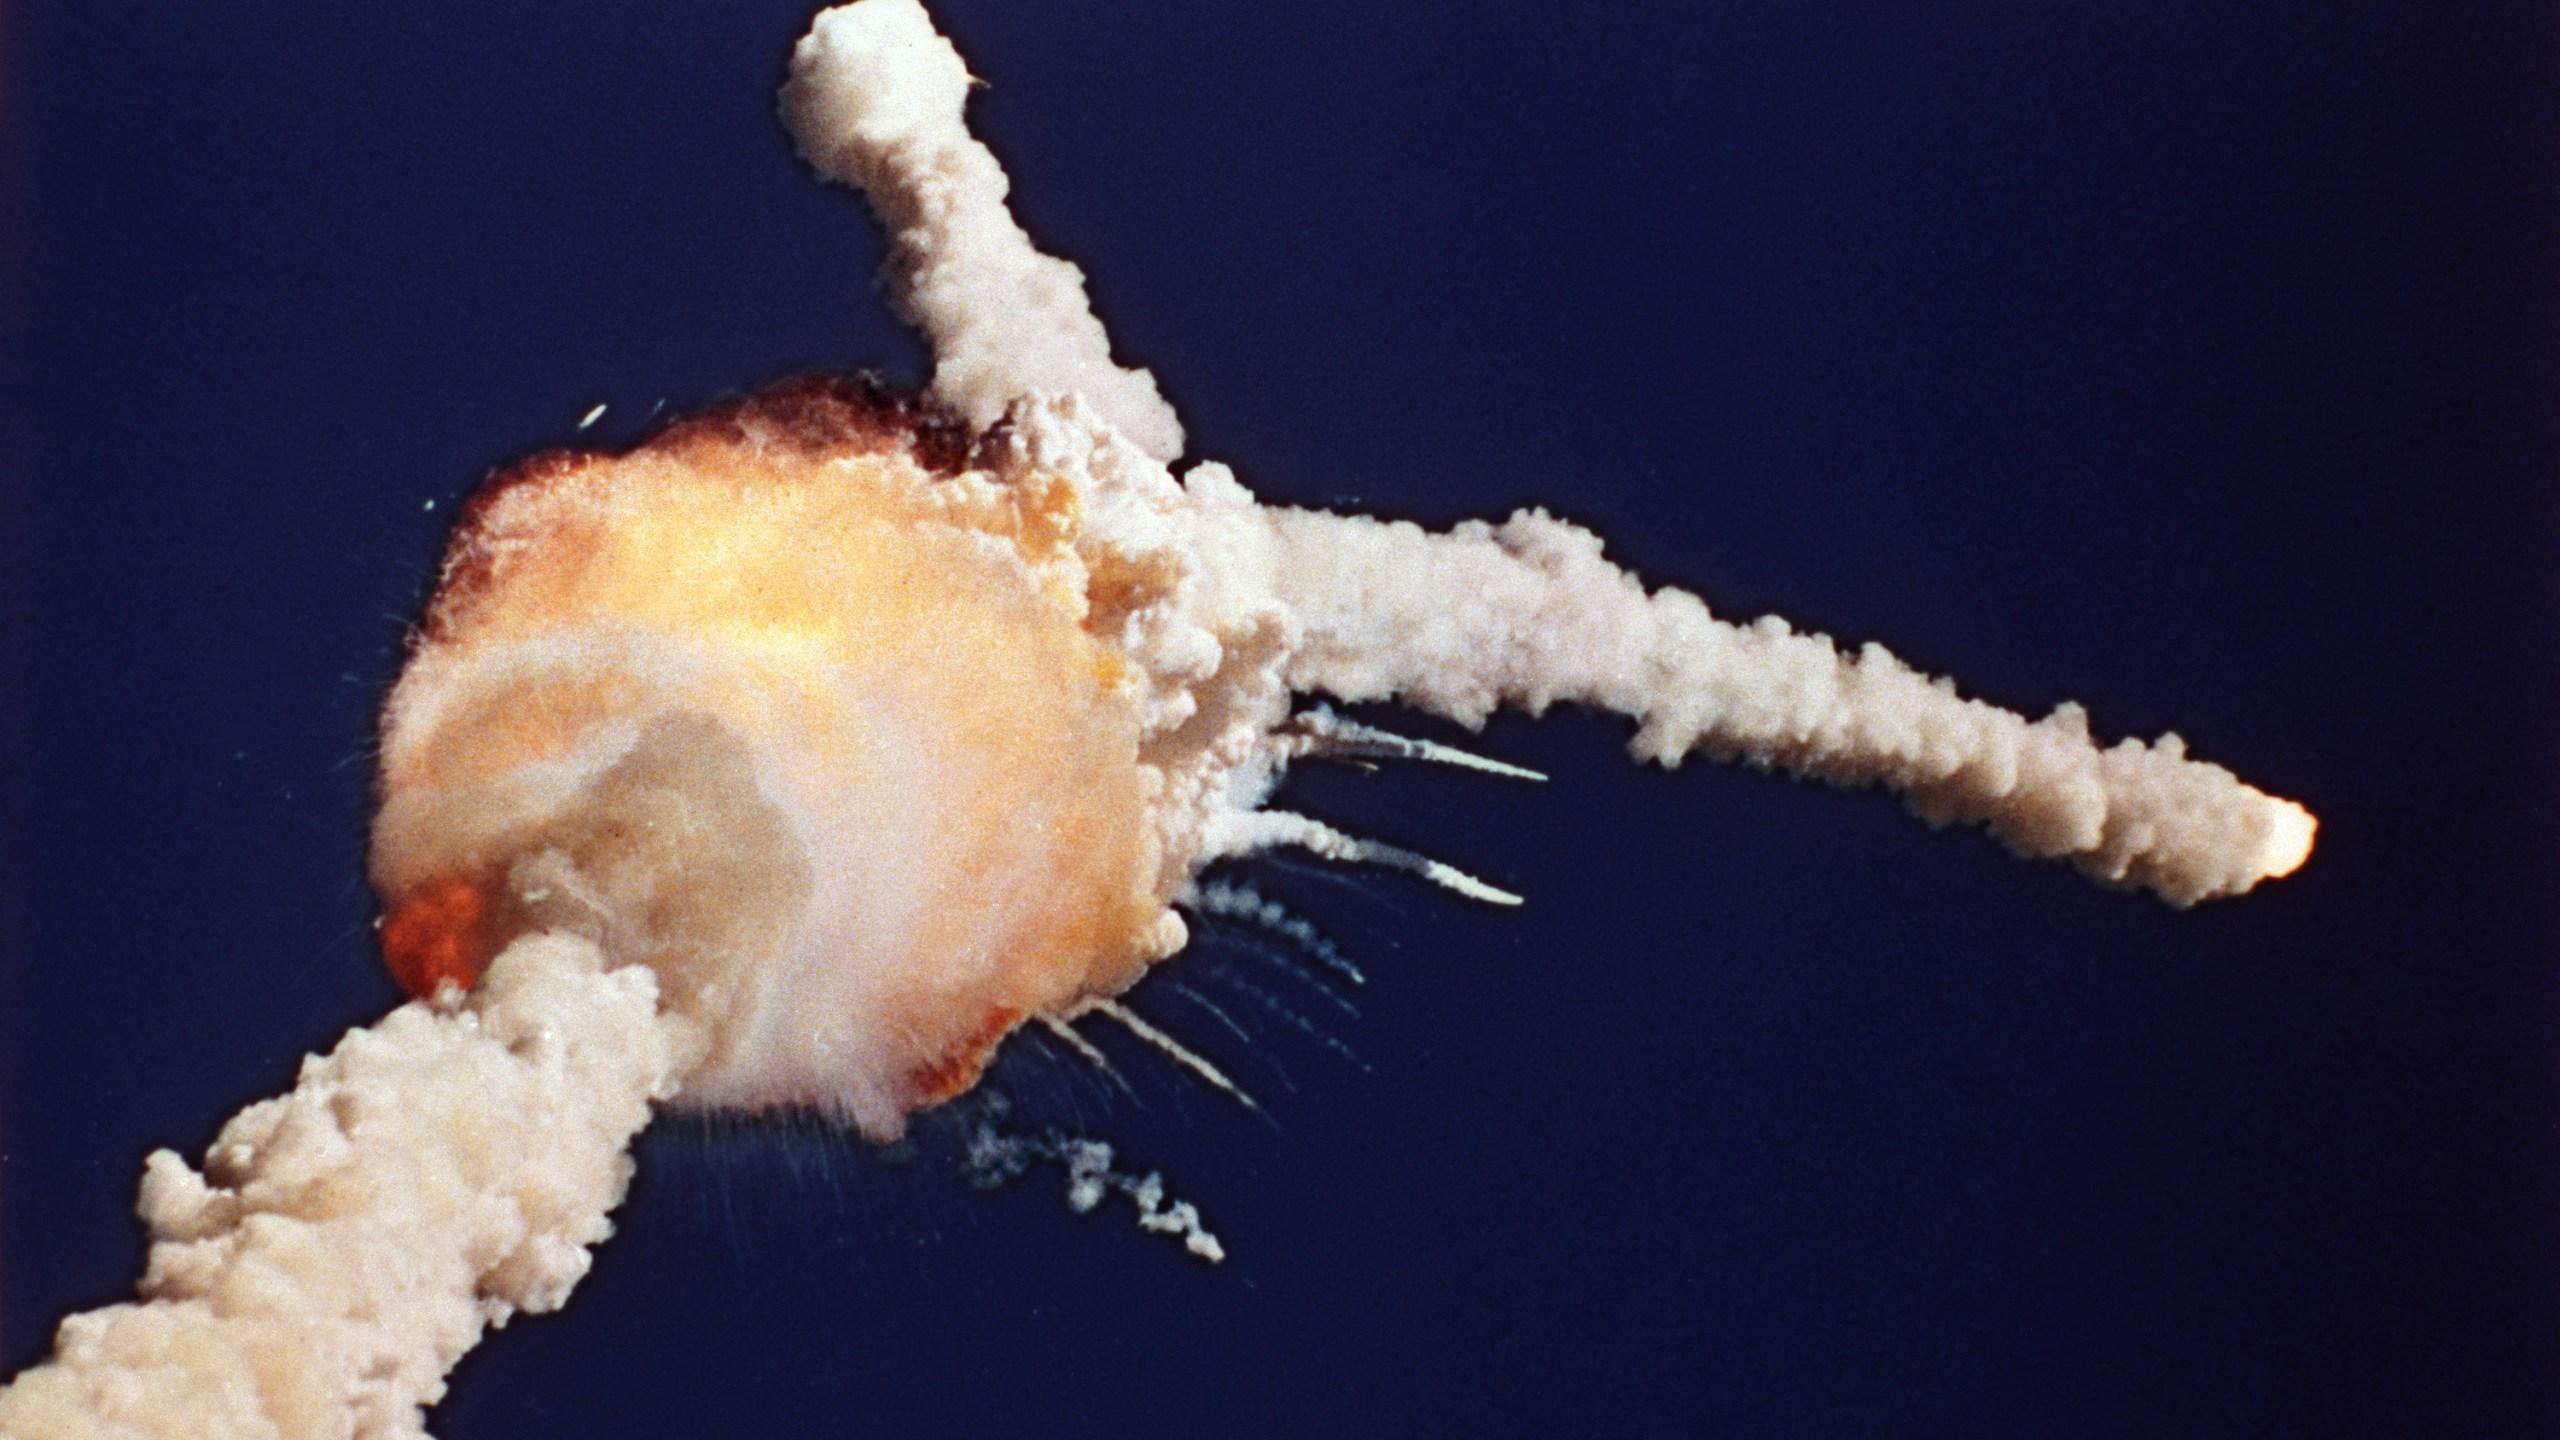 Space Shuttle Challenger_103595